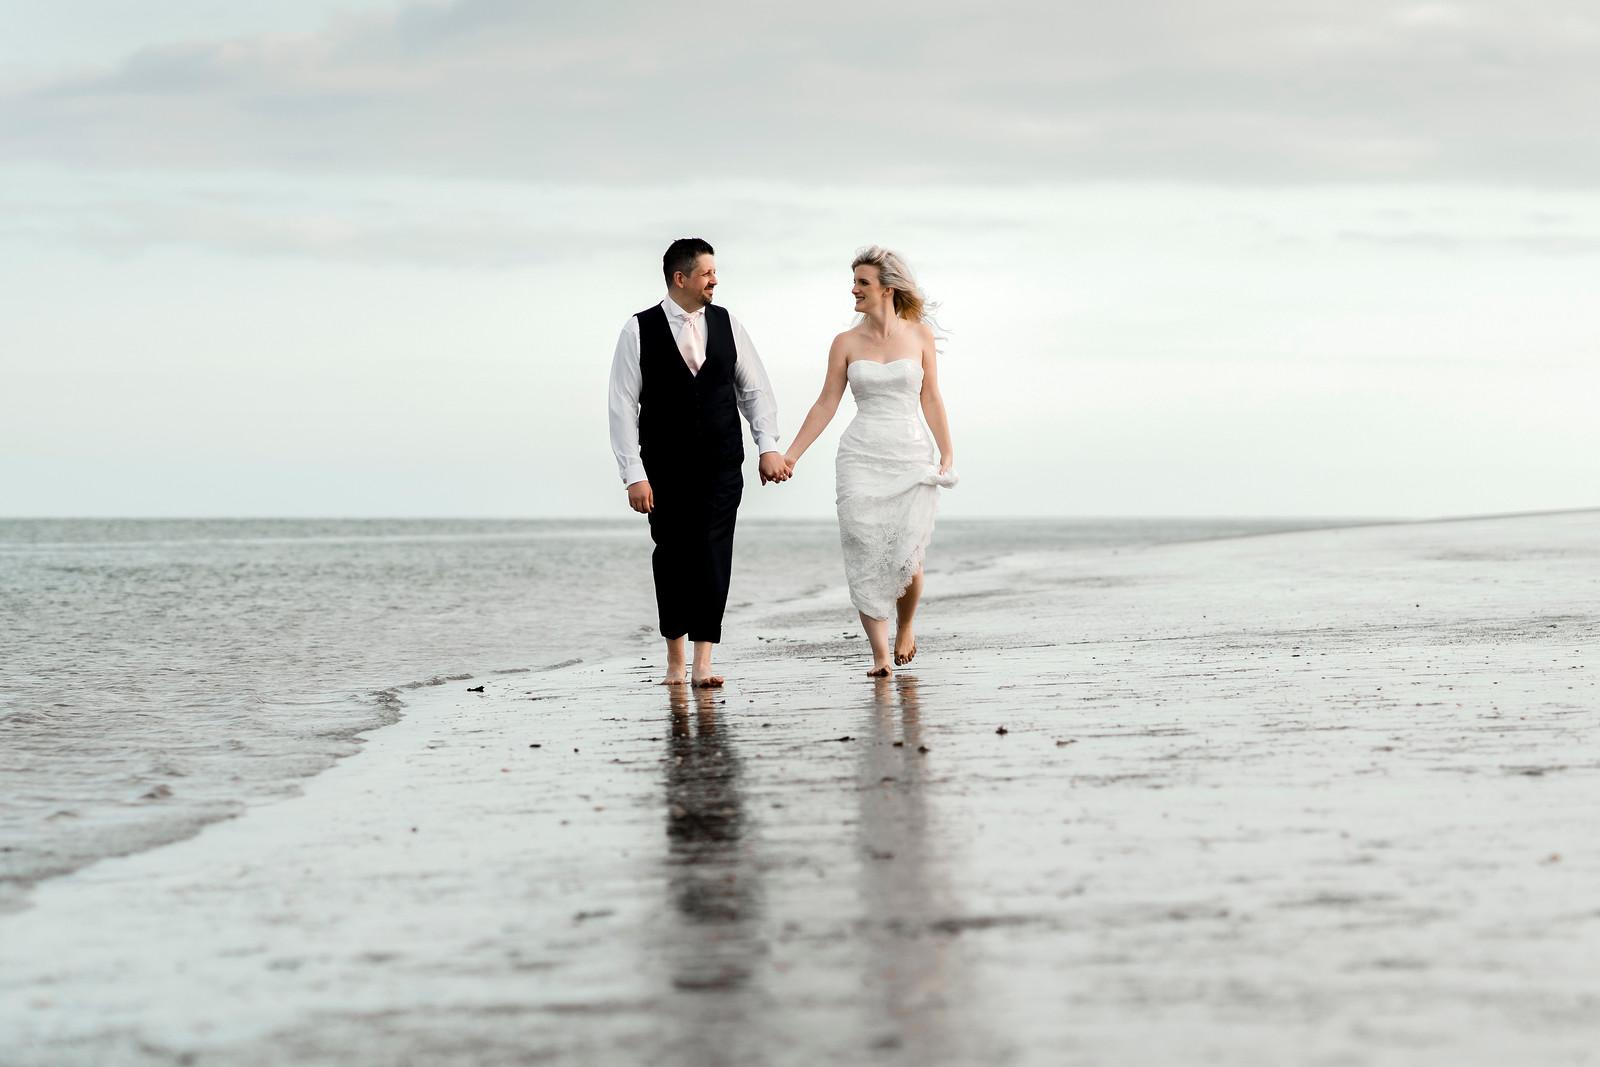 Bride and groom walk across the beach, hand in hand